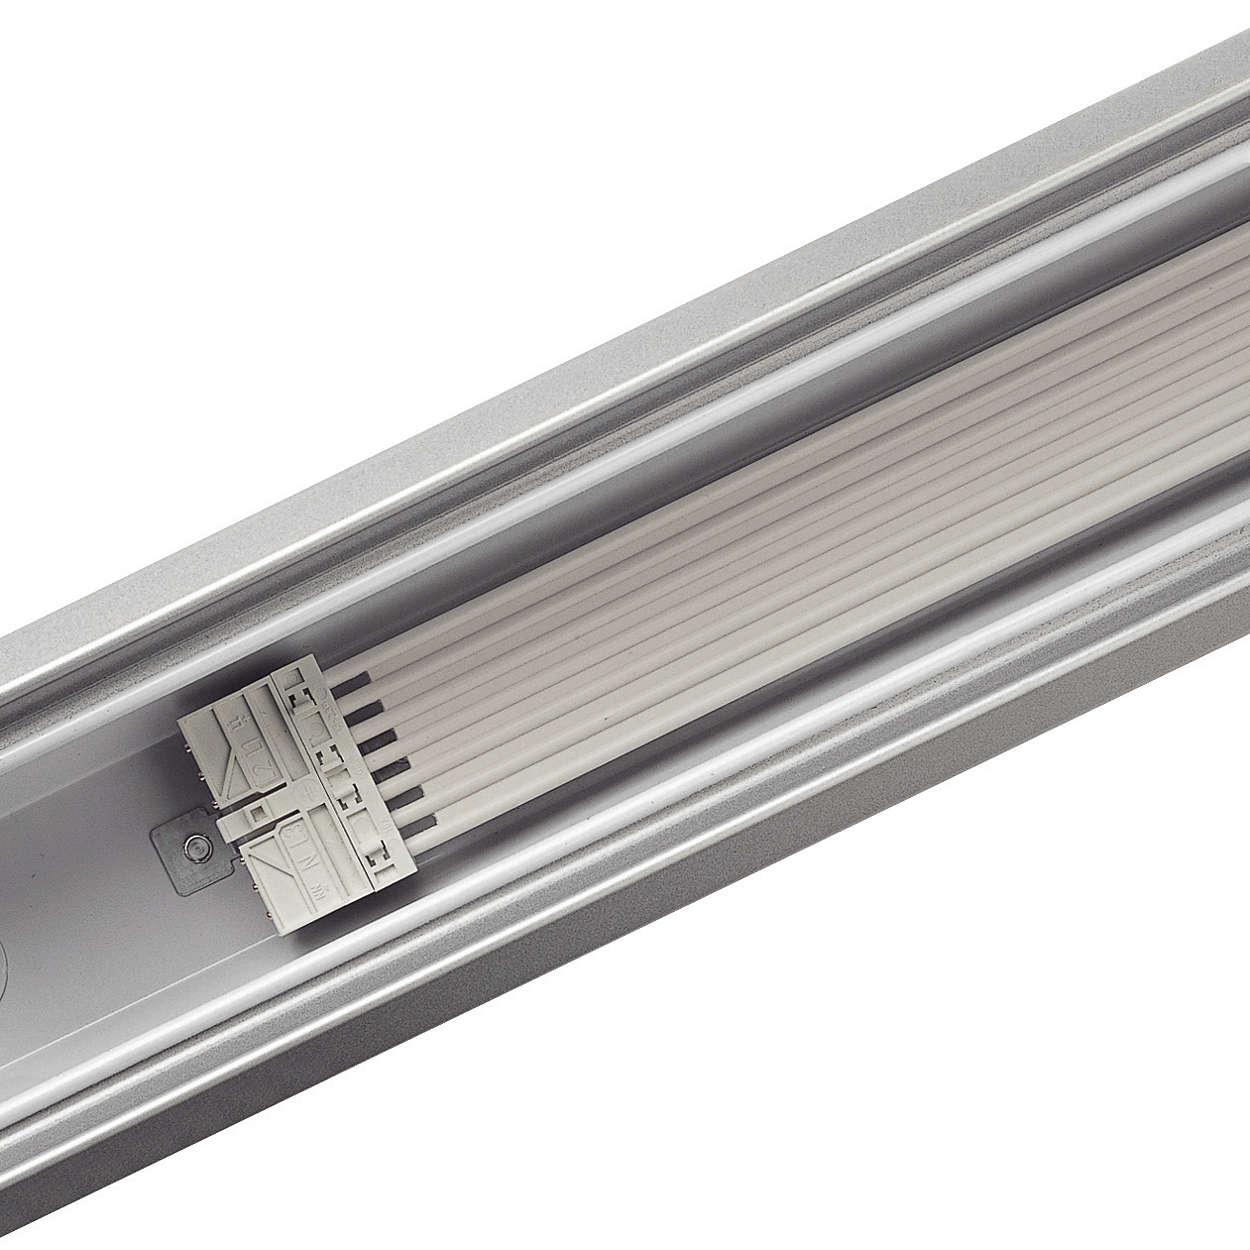 Standard trunking sections 4MX056 MAXOS TL-D